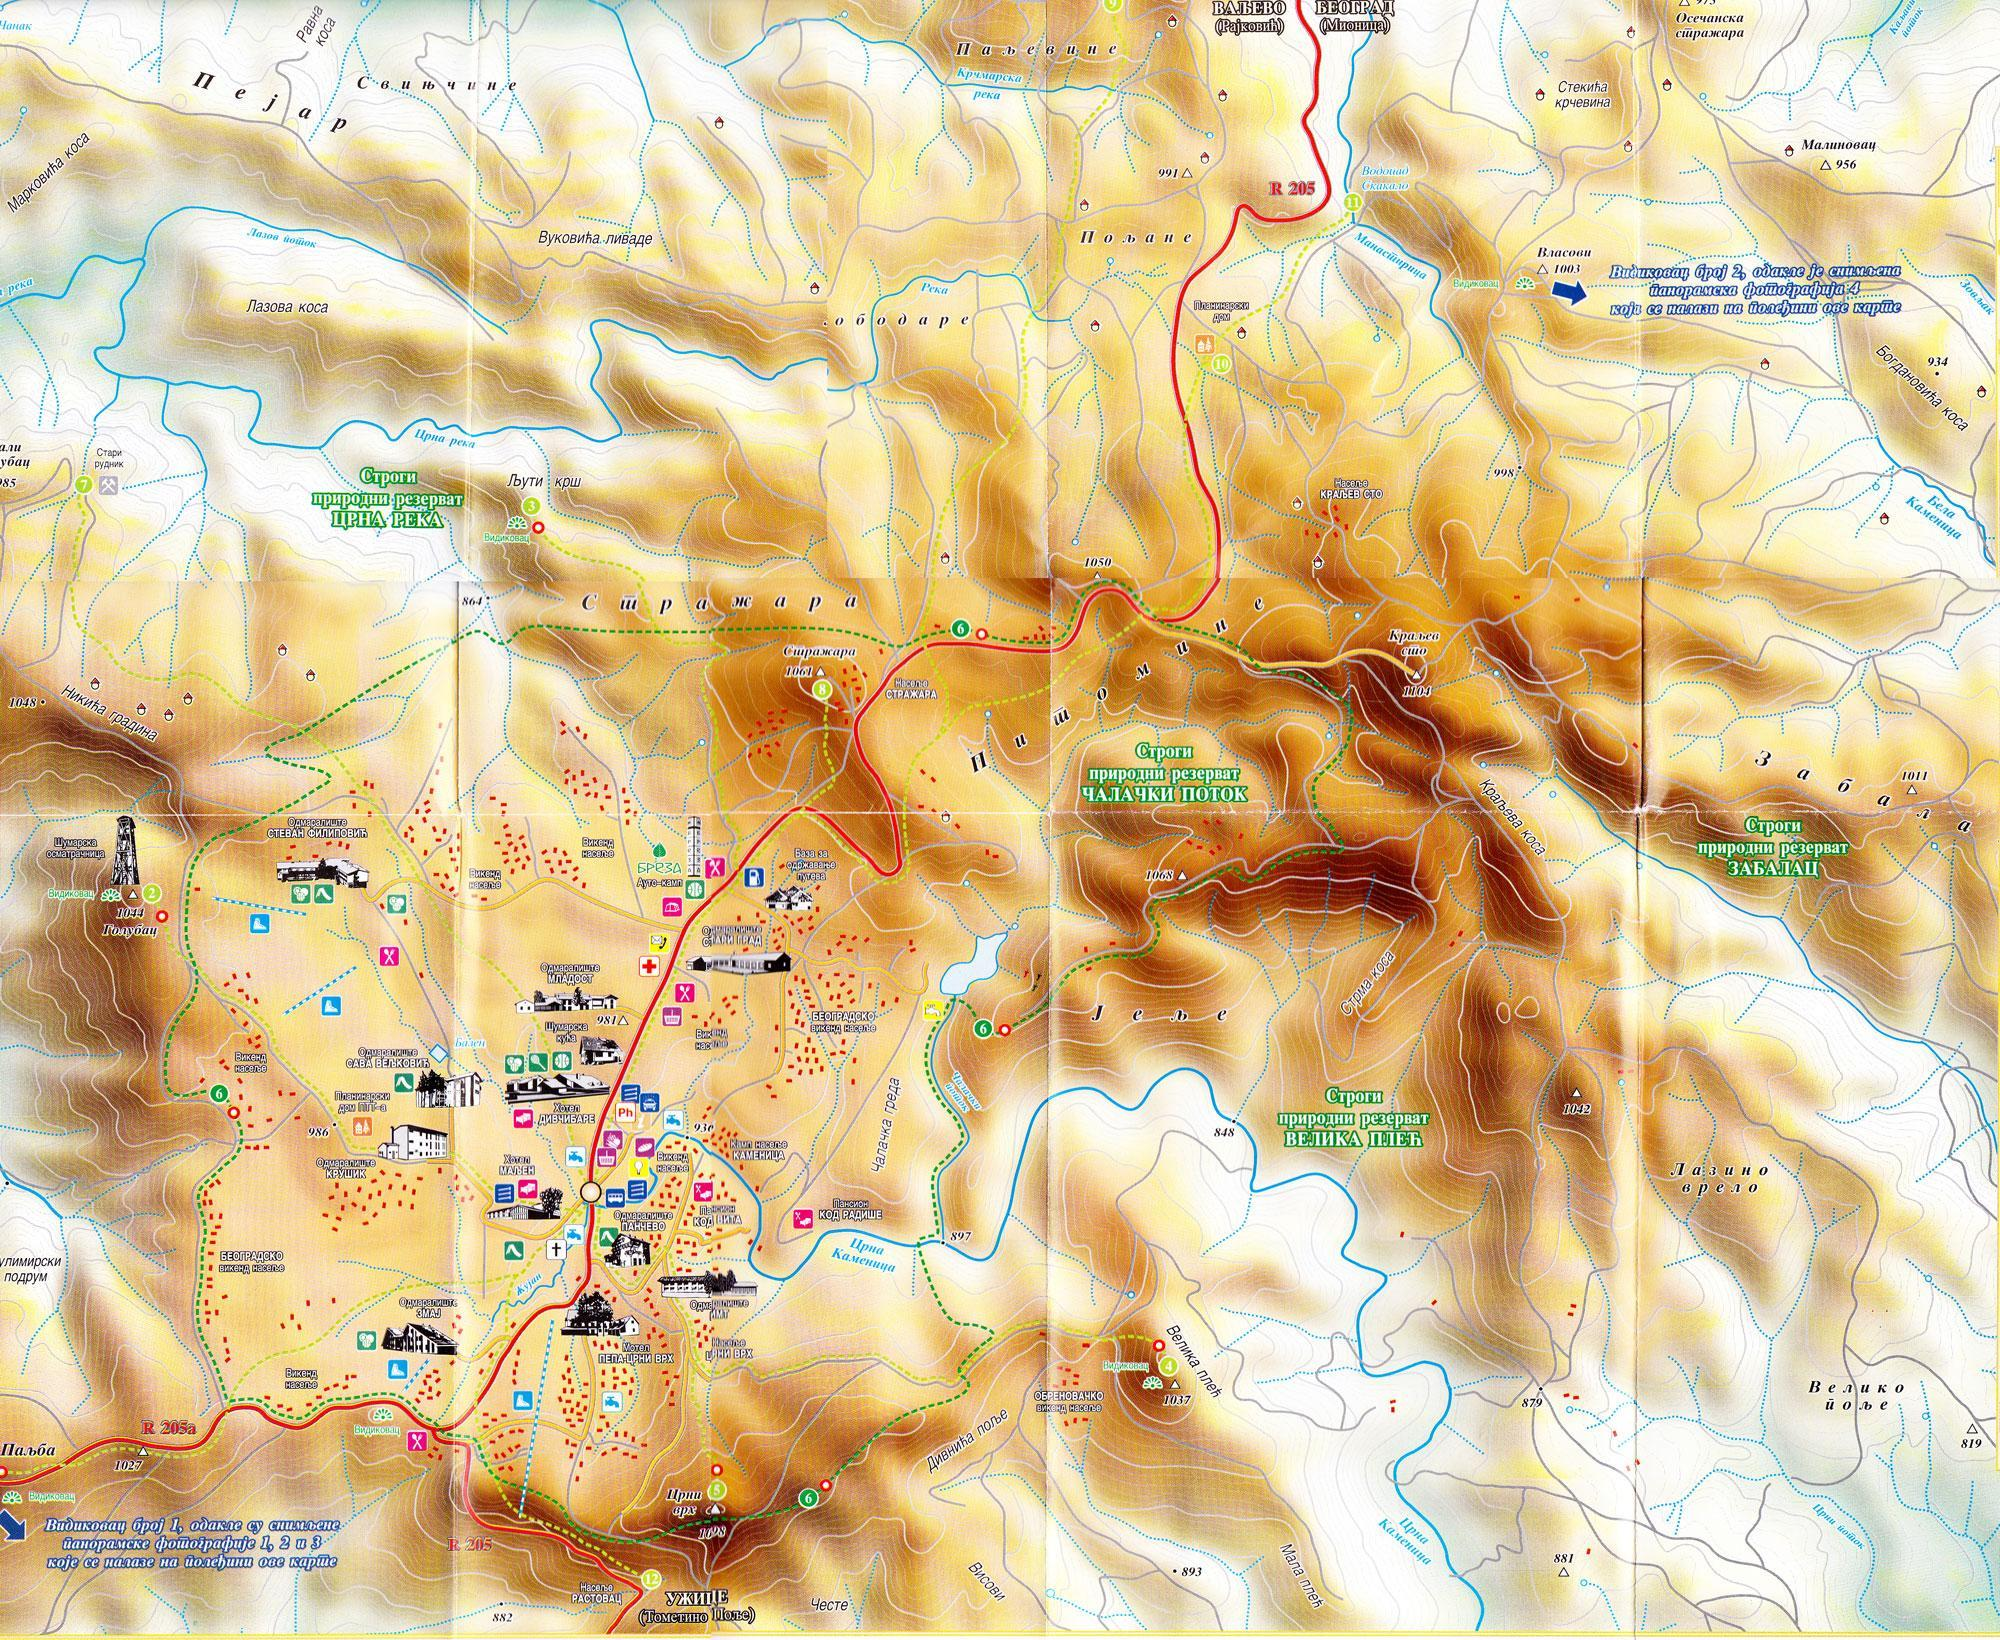 beograd divcibare mapa Divcibare Map   Divcibare Portal Mountain Divcibare beograd divcibare mapa